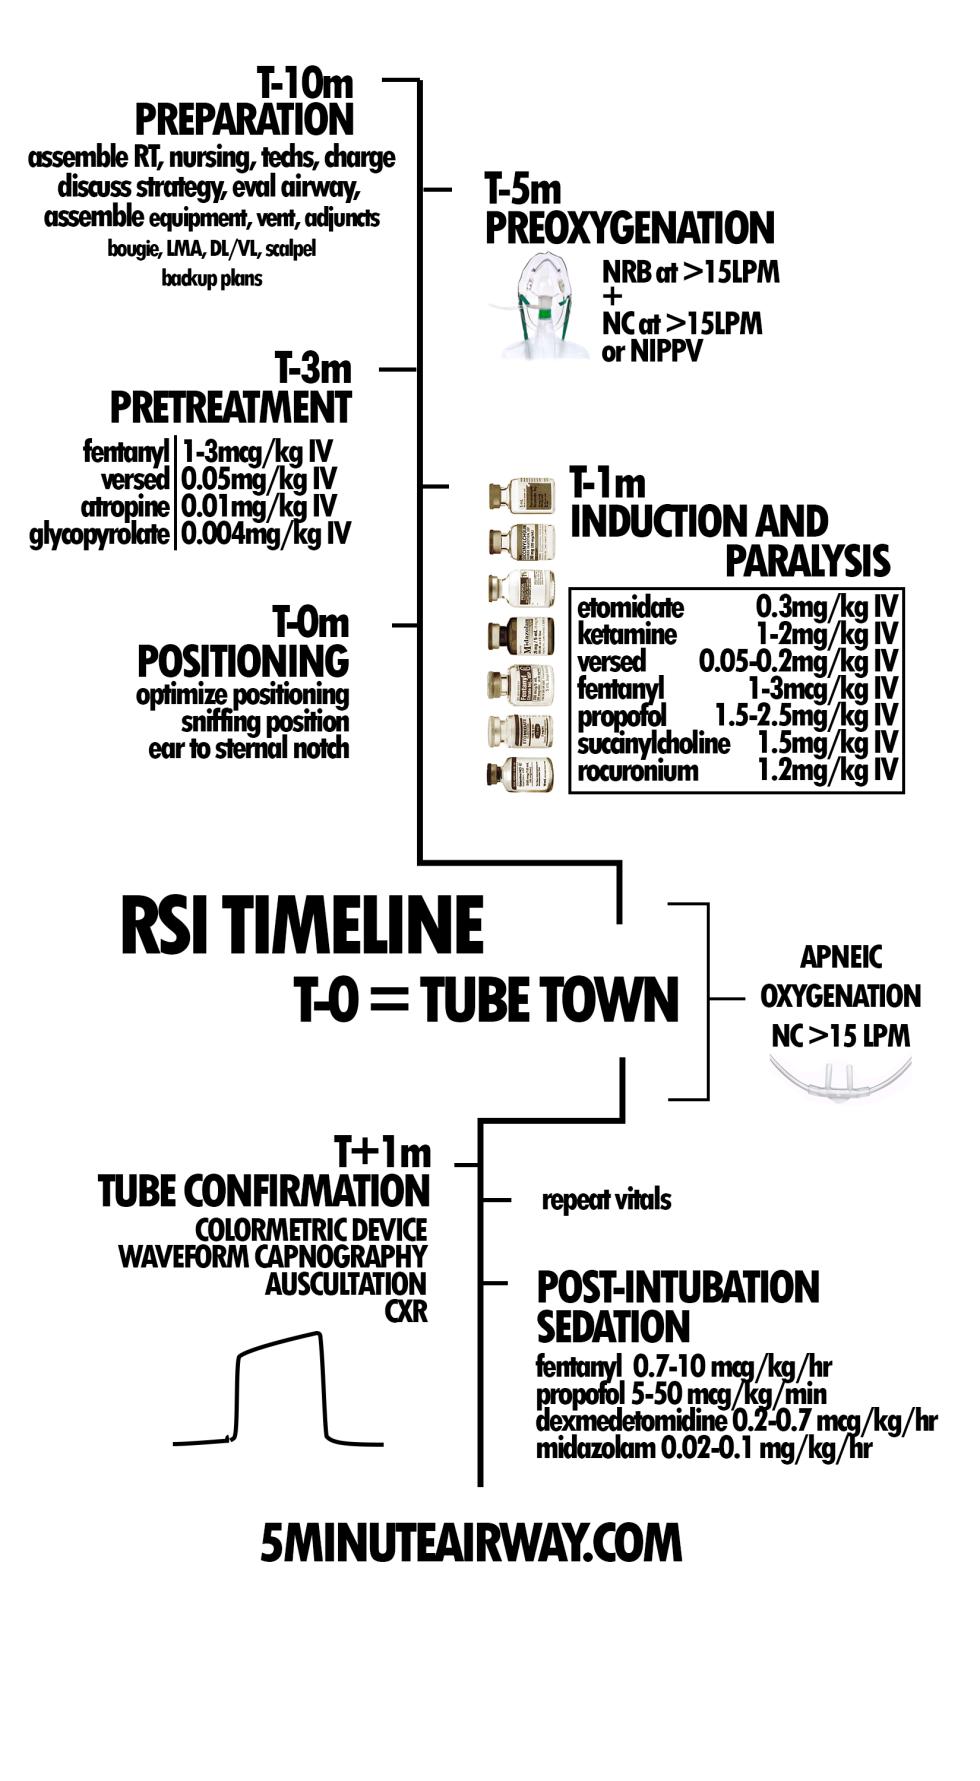 Tube town timeline